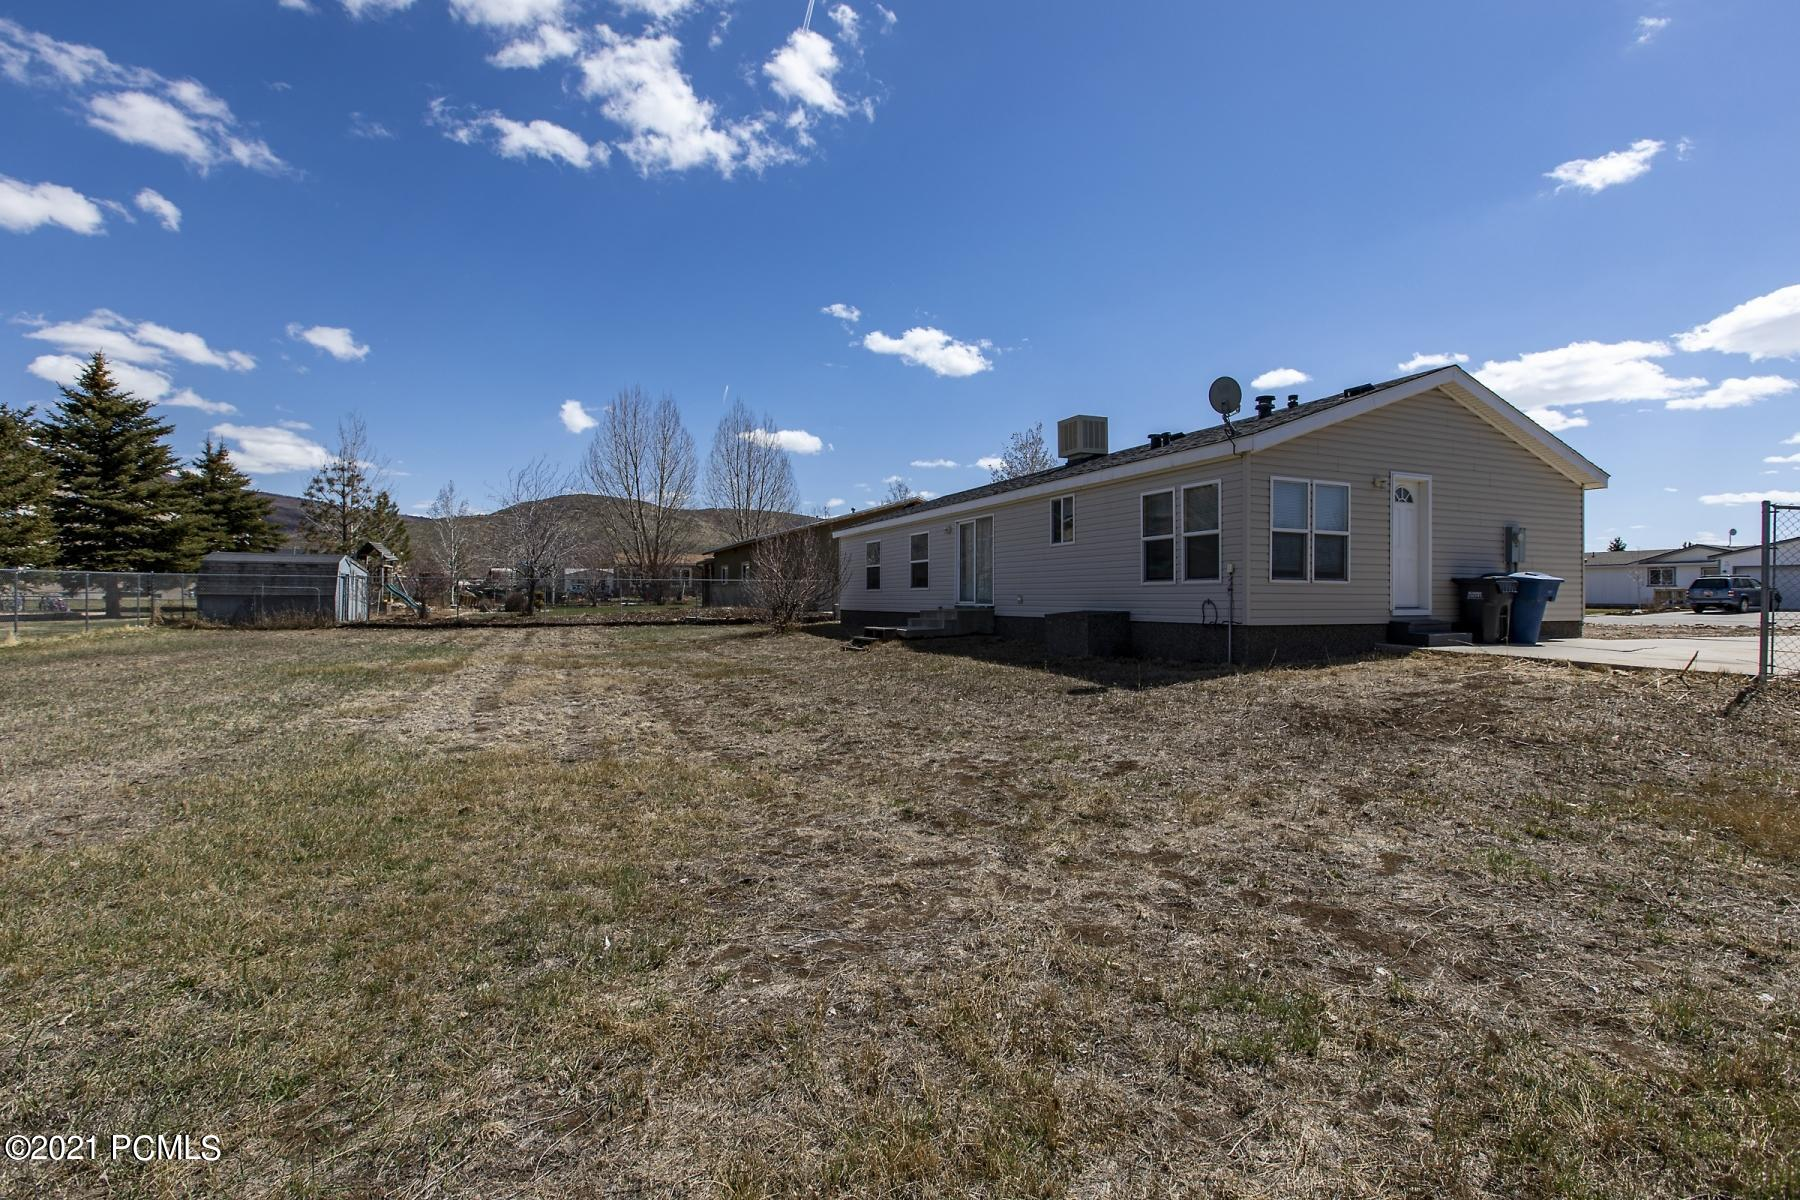 25 610 S., Kamas, Utah 84036, 3 Bedrooms Bedrooms, ,2 BathroomsBathrooms,Single Family,For Sale,610 S.,12101433